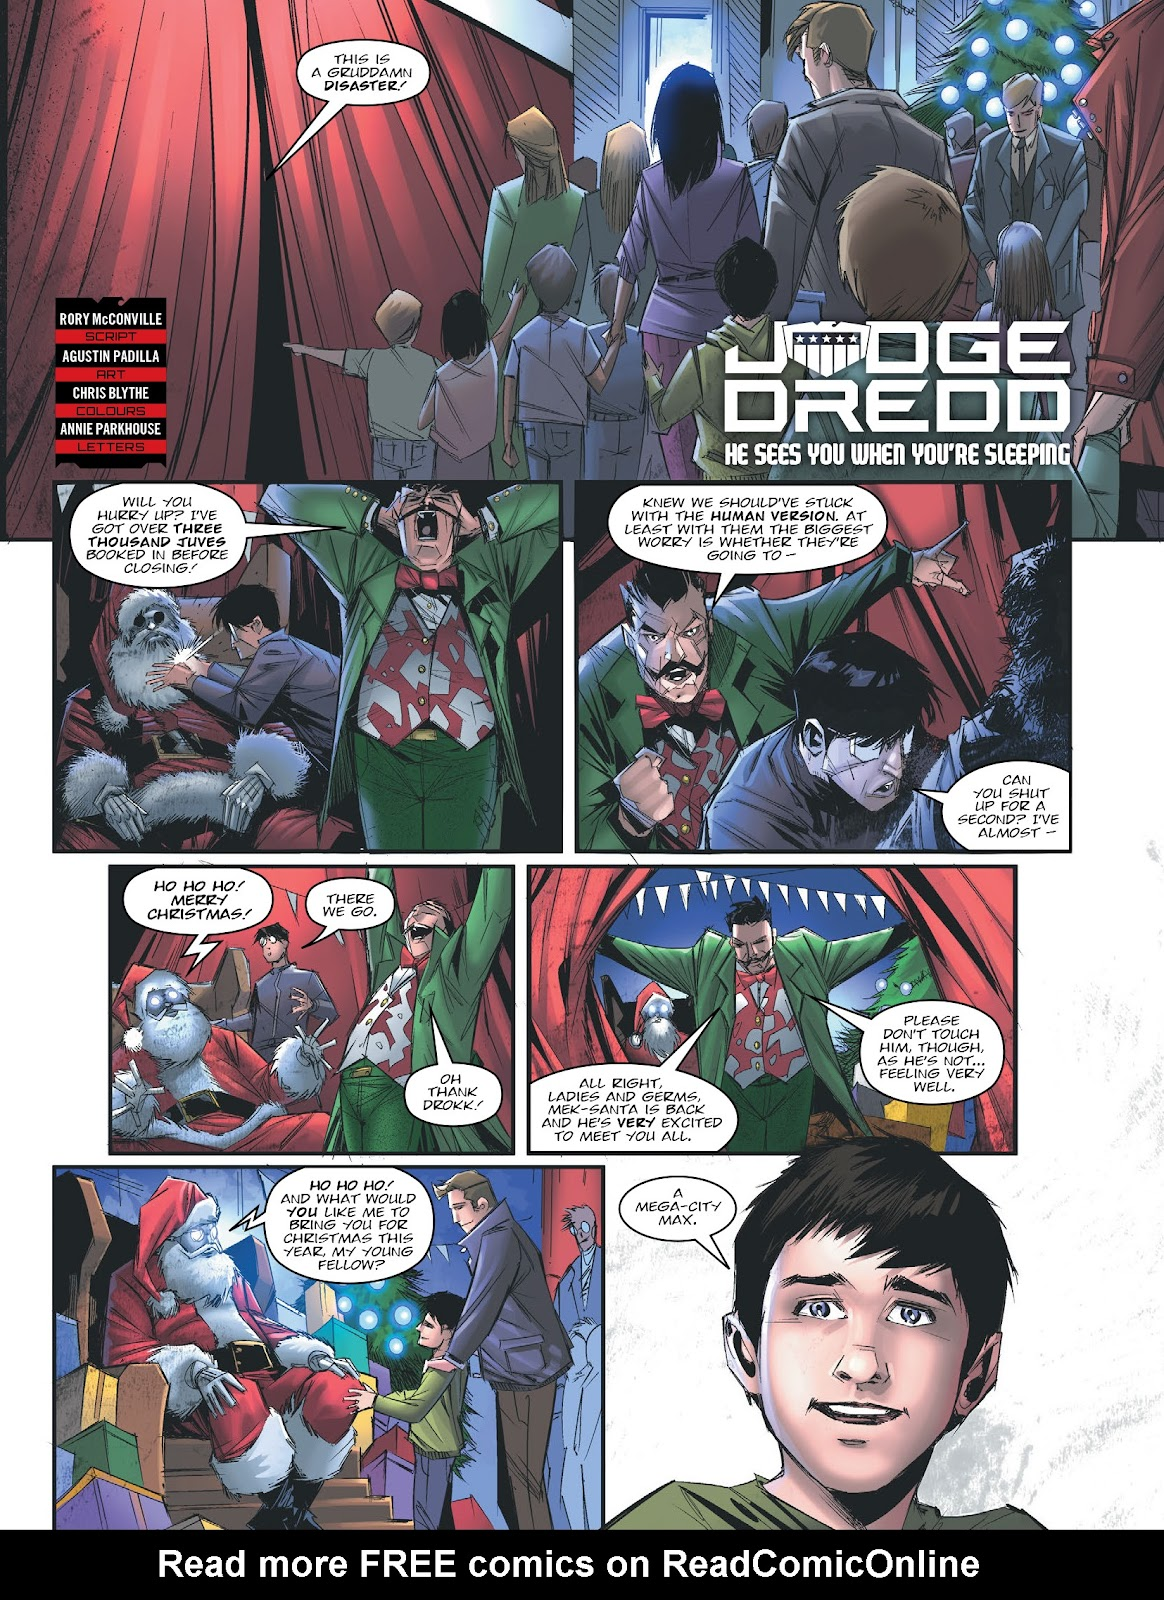 Judge Dredd Megazine (Vol. 5) issue 427 - Page 5